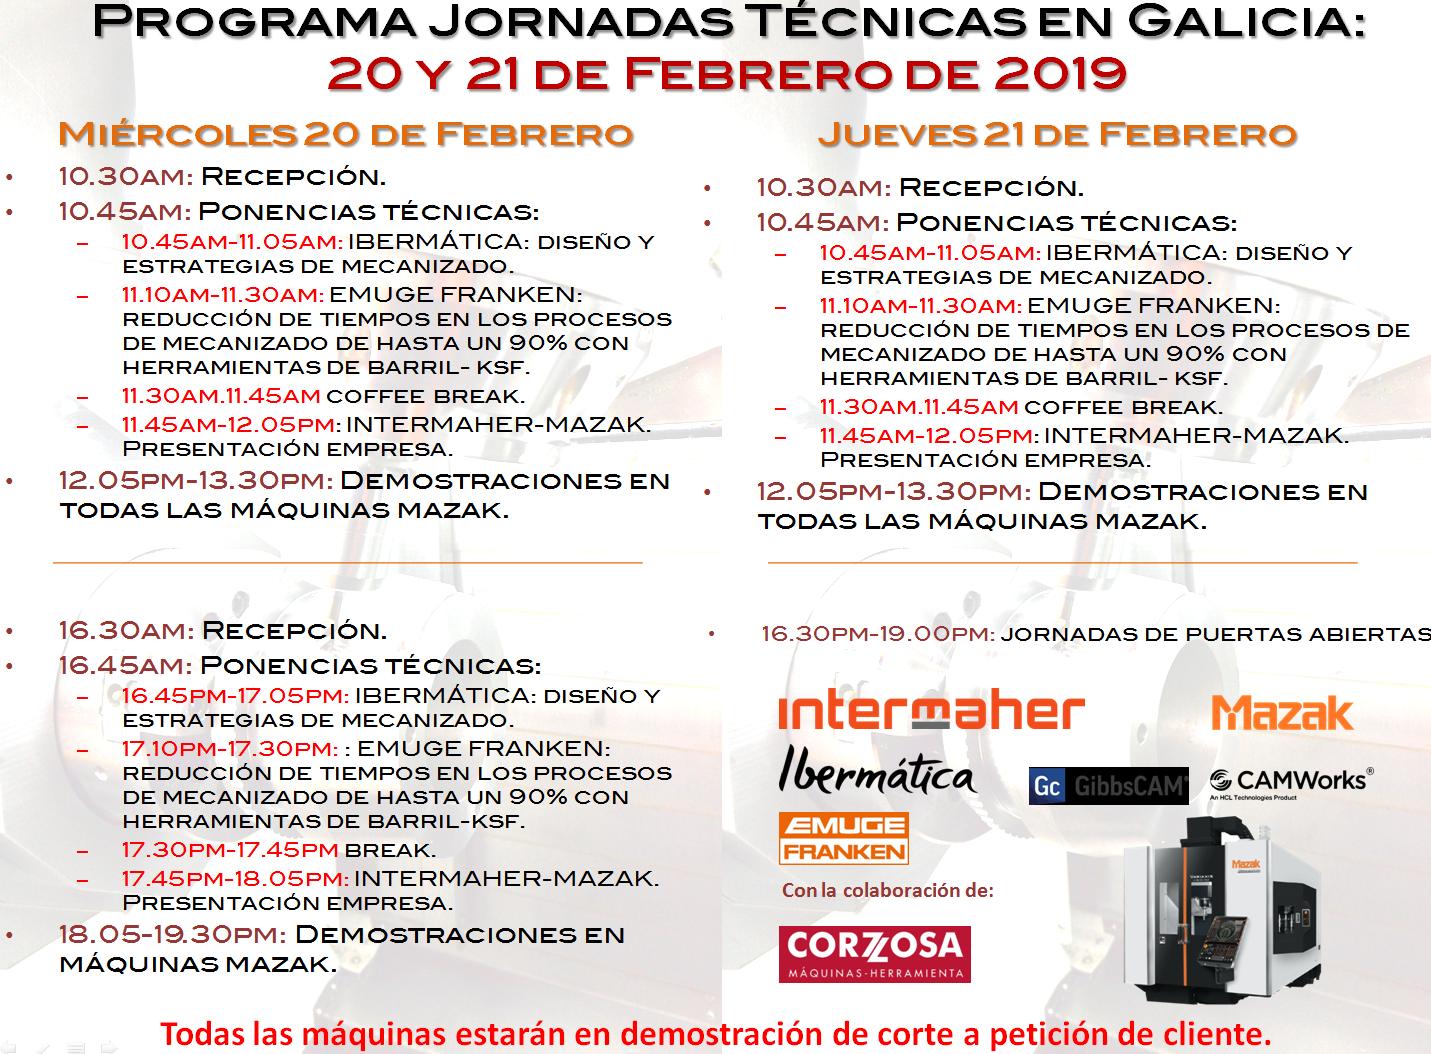 Programa Jornadas Técnicas Galicia Intermaher Mazak